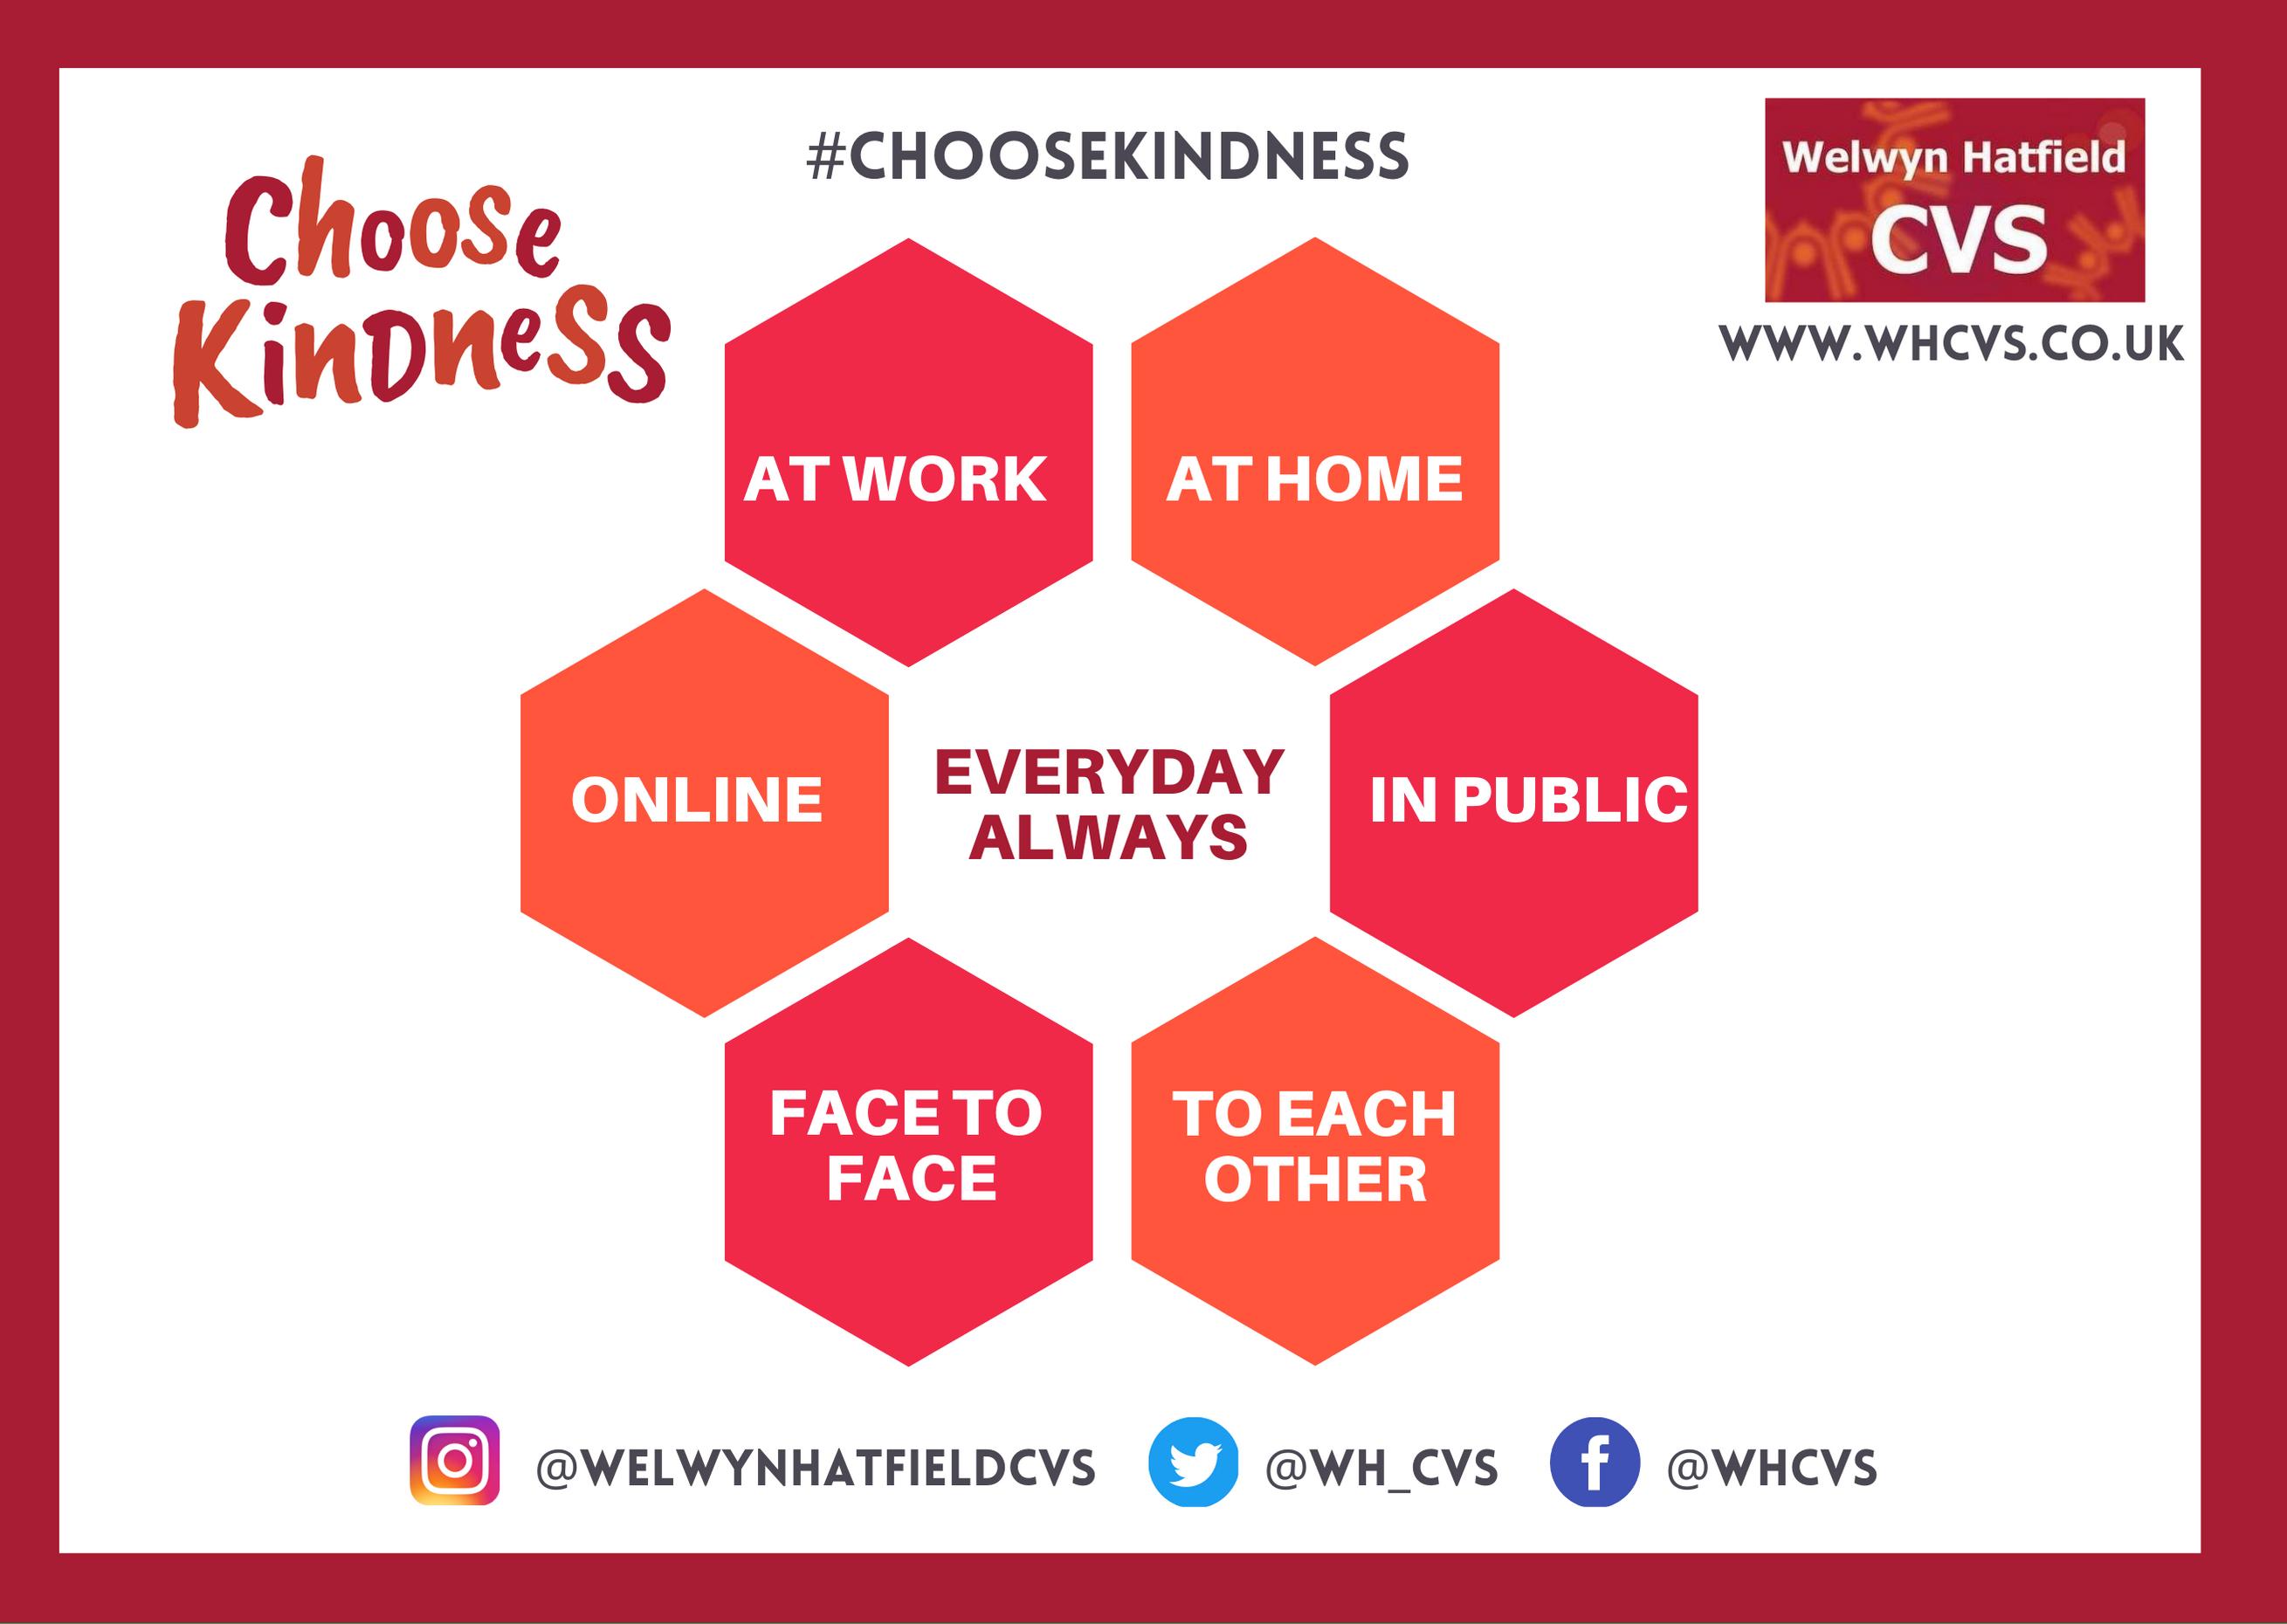 Choose Kindness Post Everyday Always